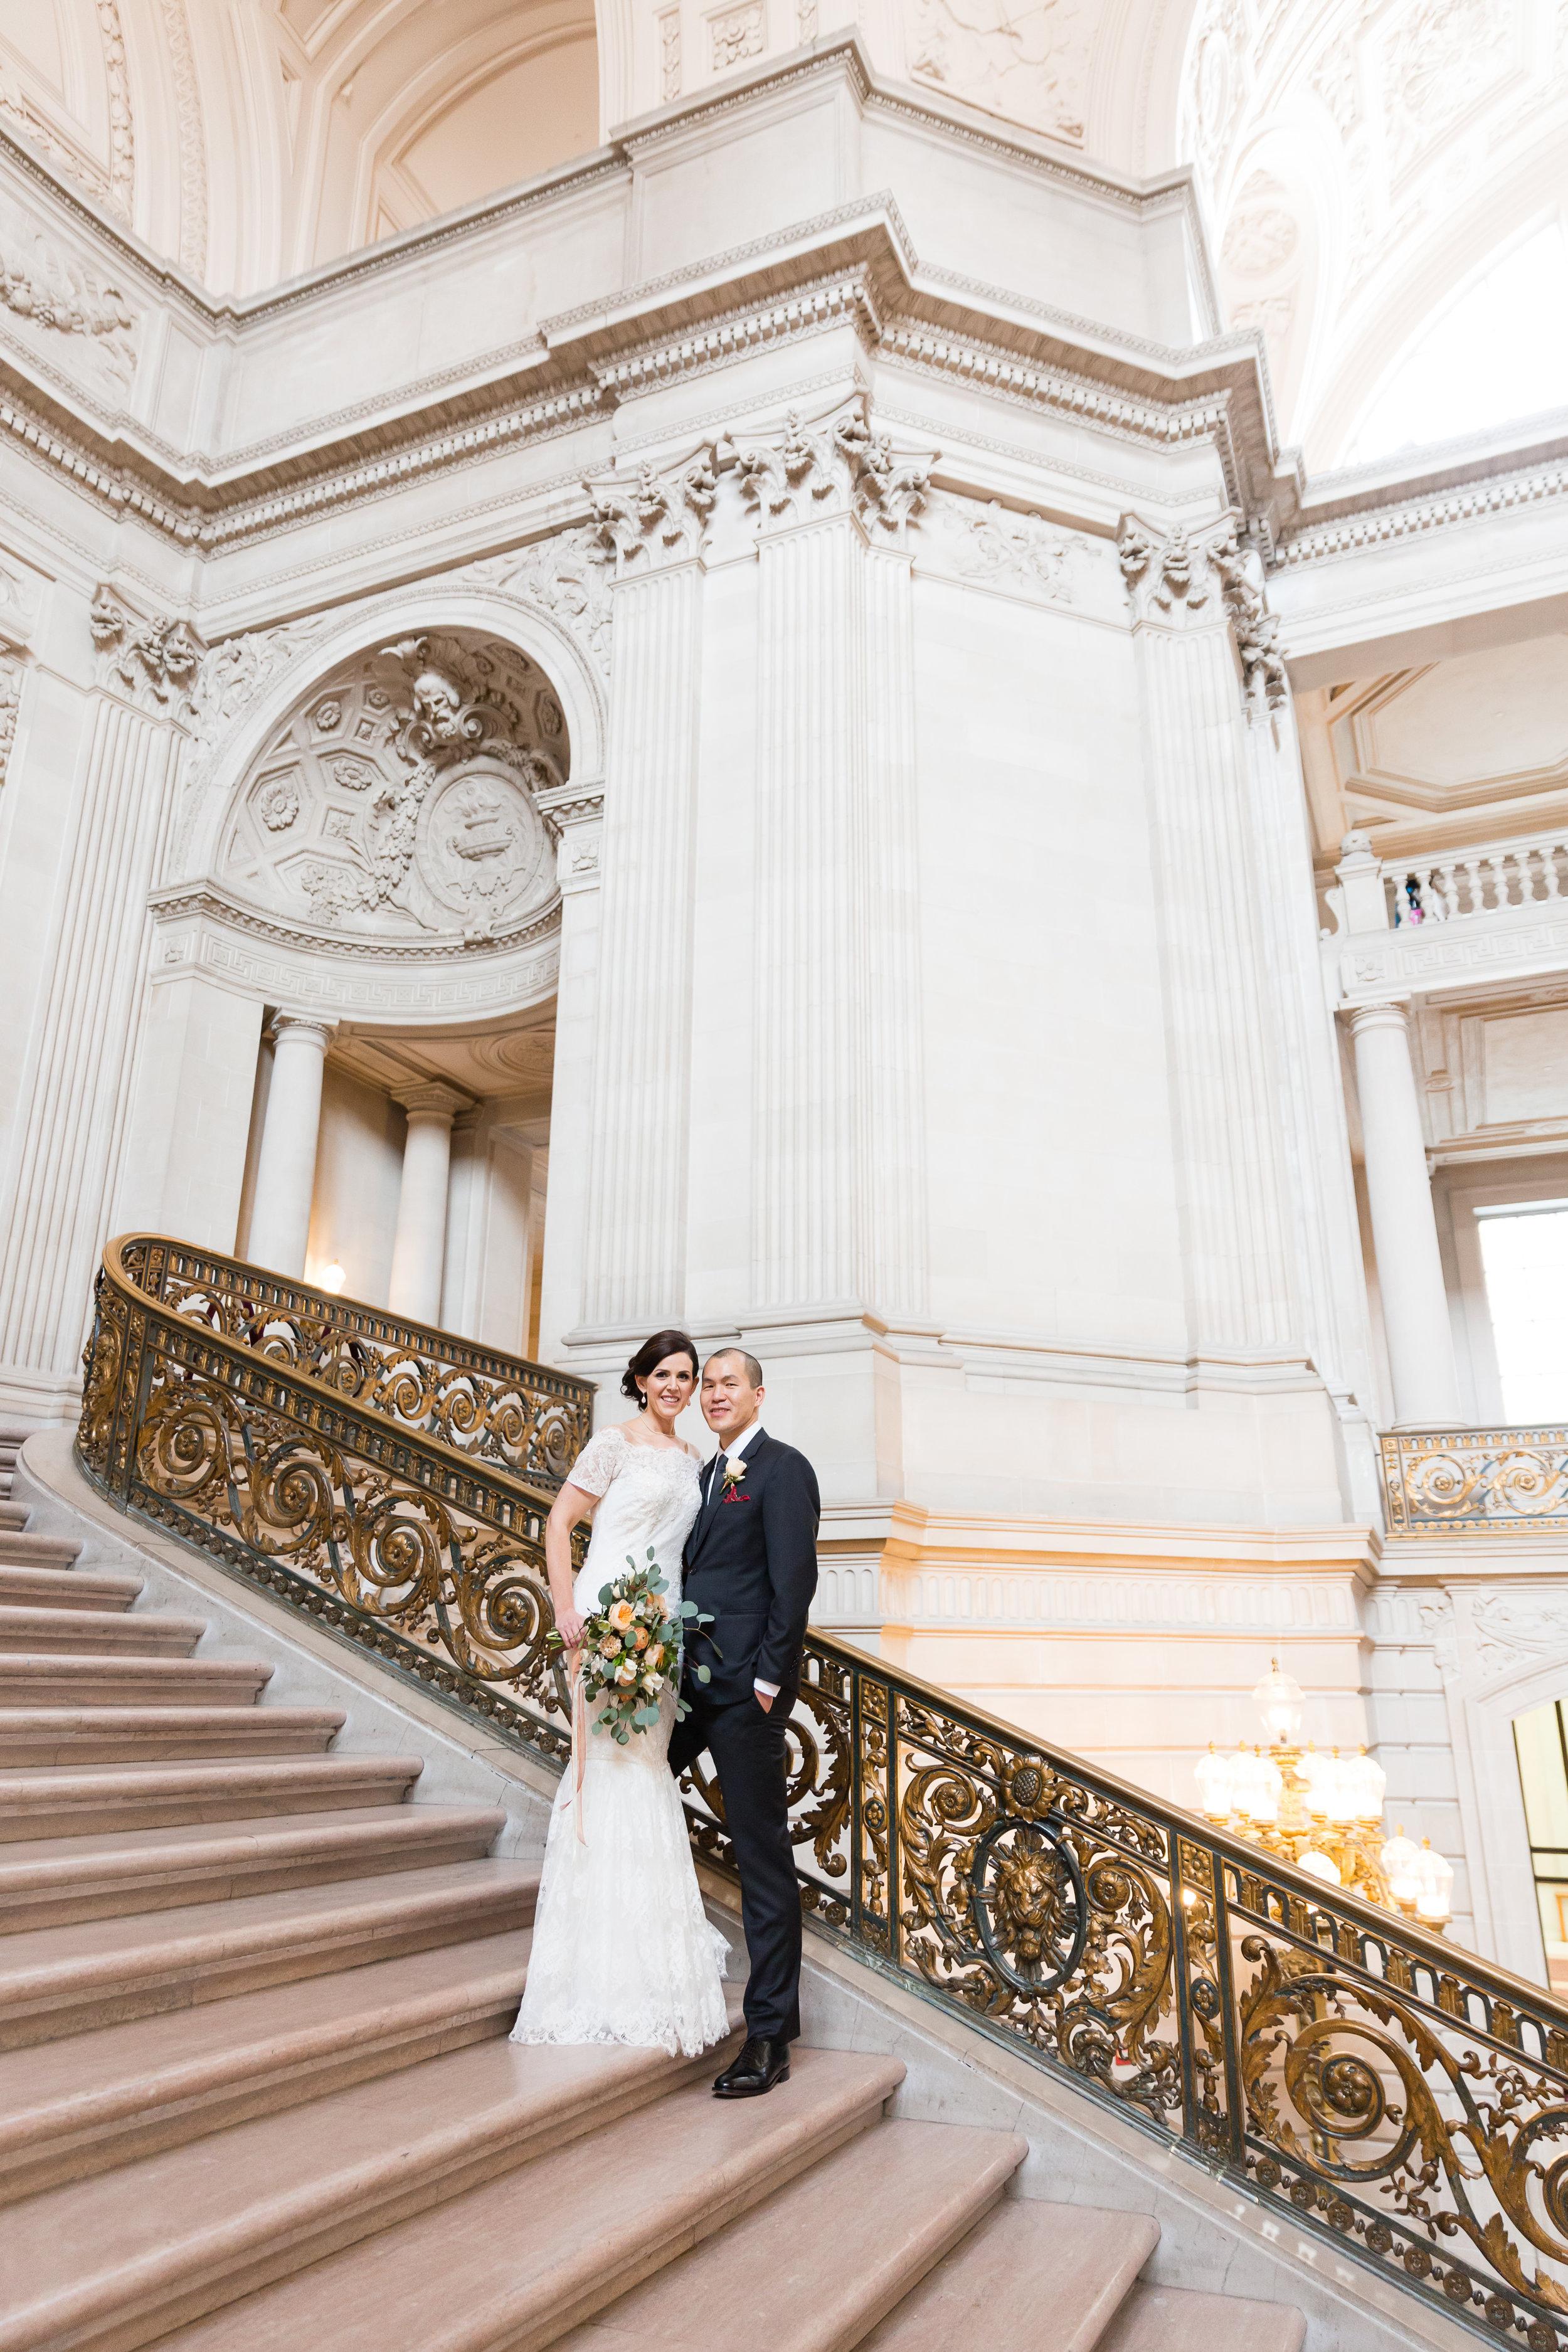 Liz-Henry-Forge-Oakland-Wedding-178.jpg